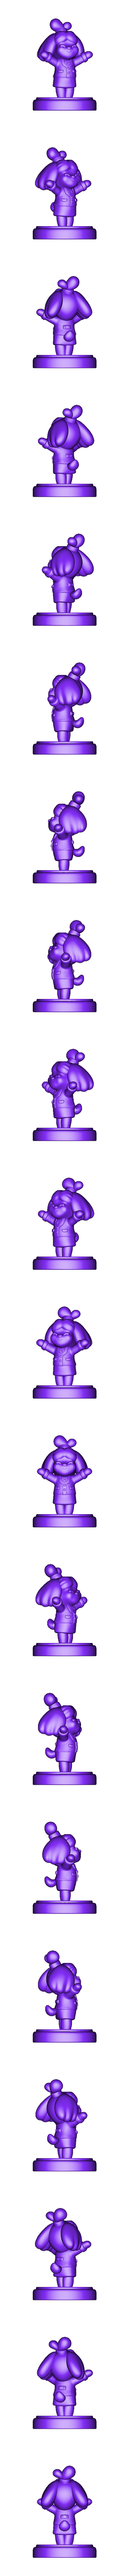 isabelle.OBJ Descargar archivo OBJ Isabelle // Animal Crossing New Horizons • Objeto para imprimir en 3D, MatteoMoscatelli